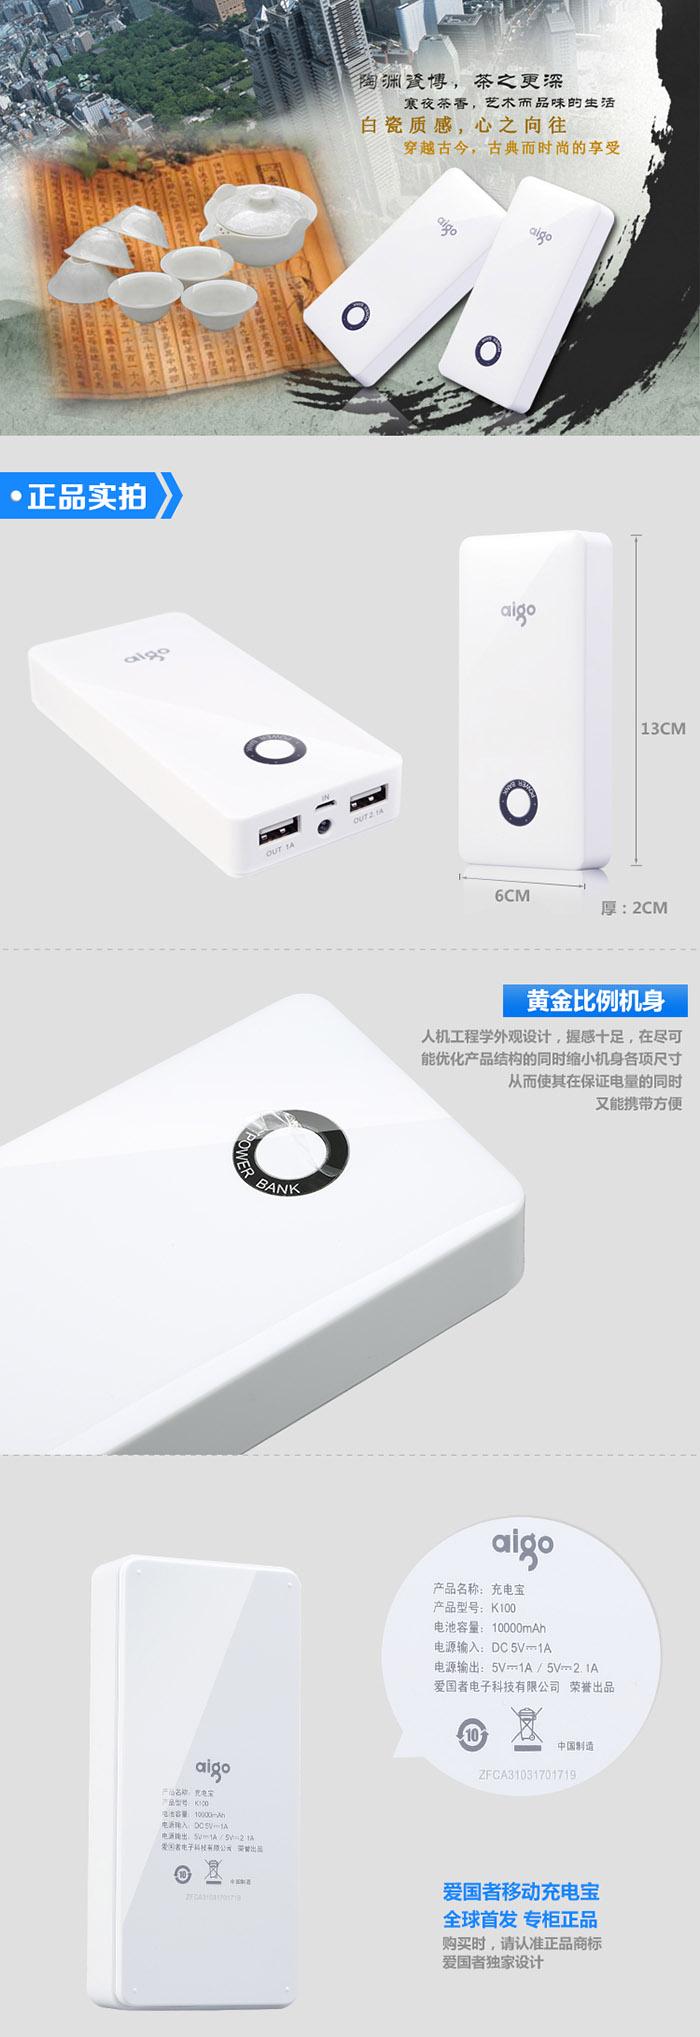 ramos蓝魔 i9白色 英特尔芯片平板电脑 aigo爱国者 k100白色 充电宝 j